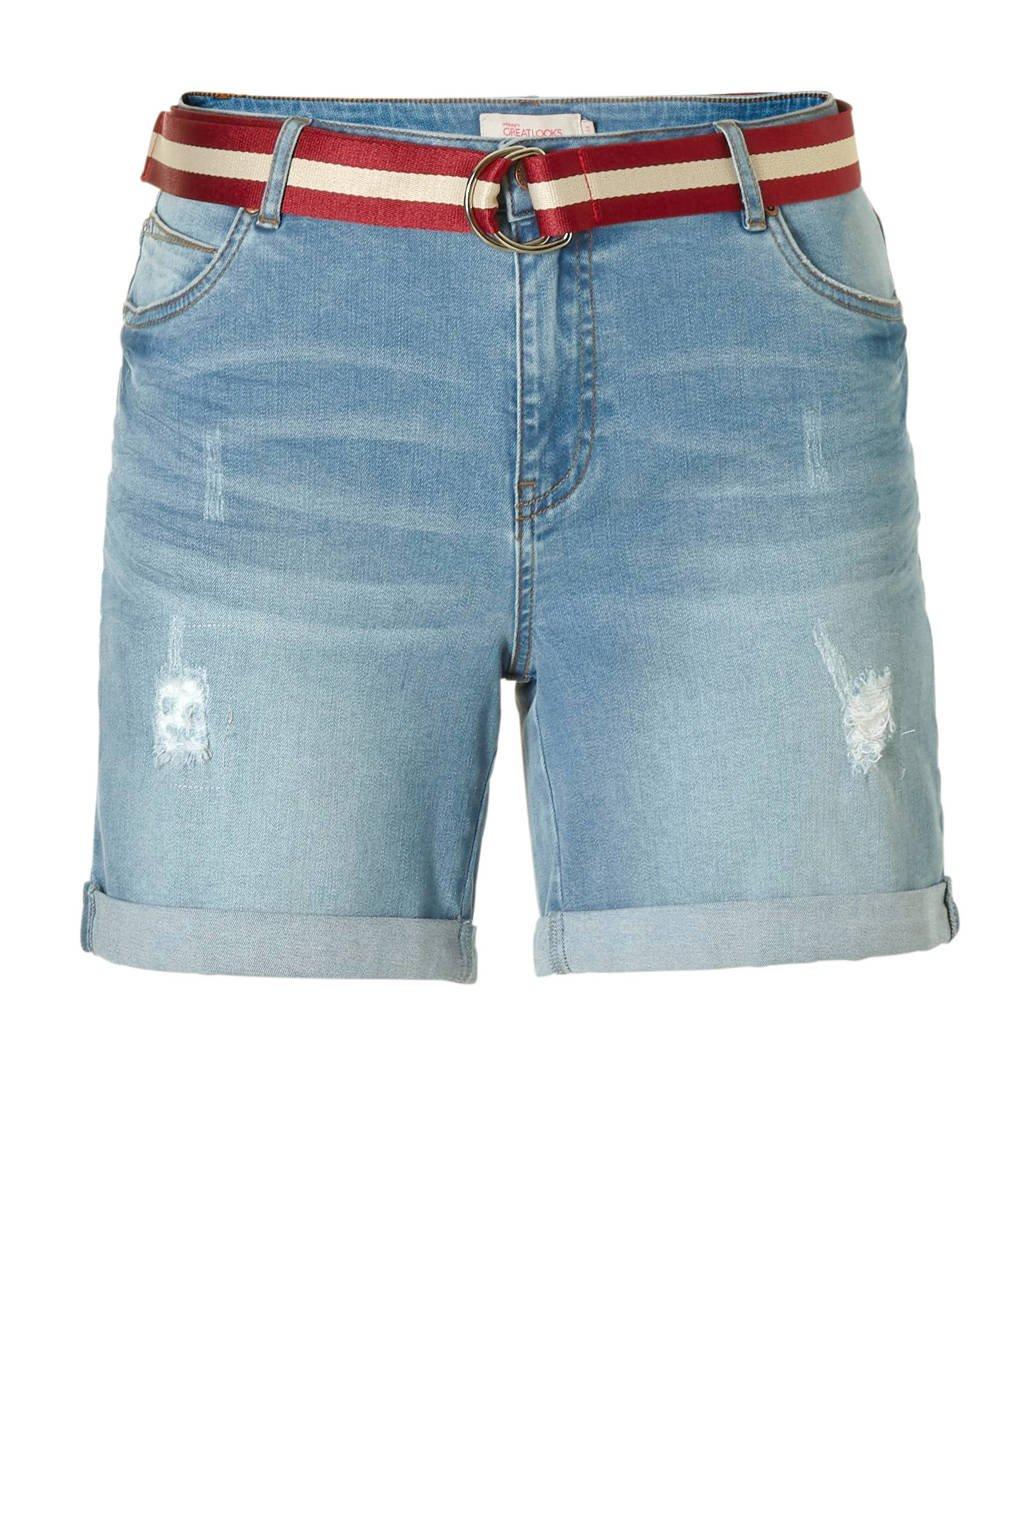 whkmp's great looks denim short met riem, Stonewashed blauw